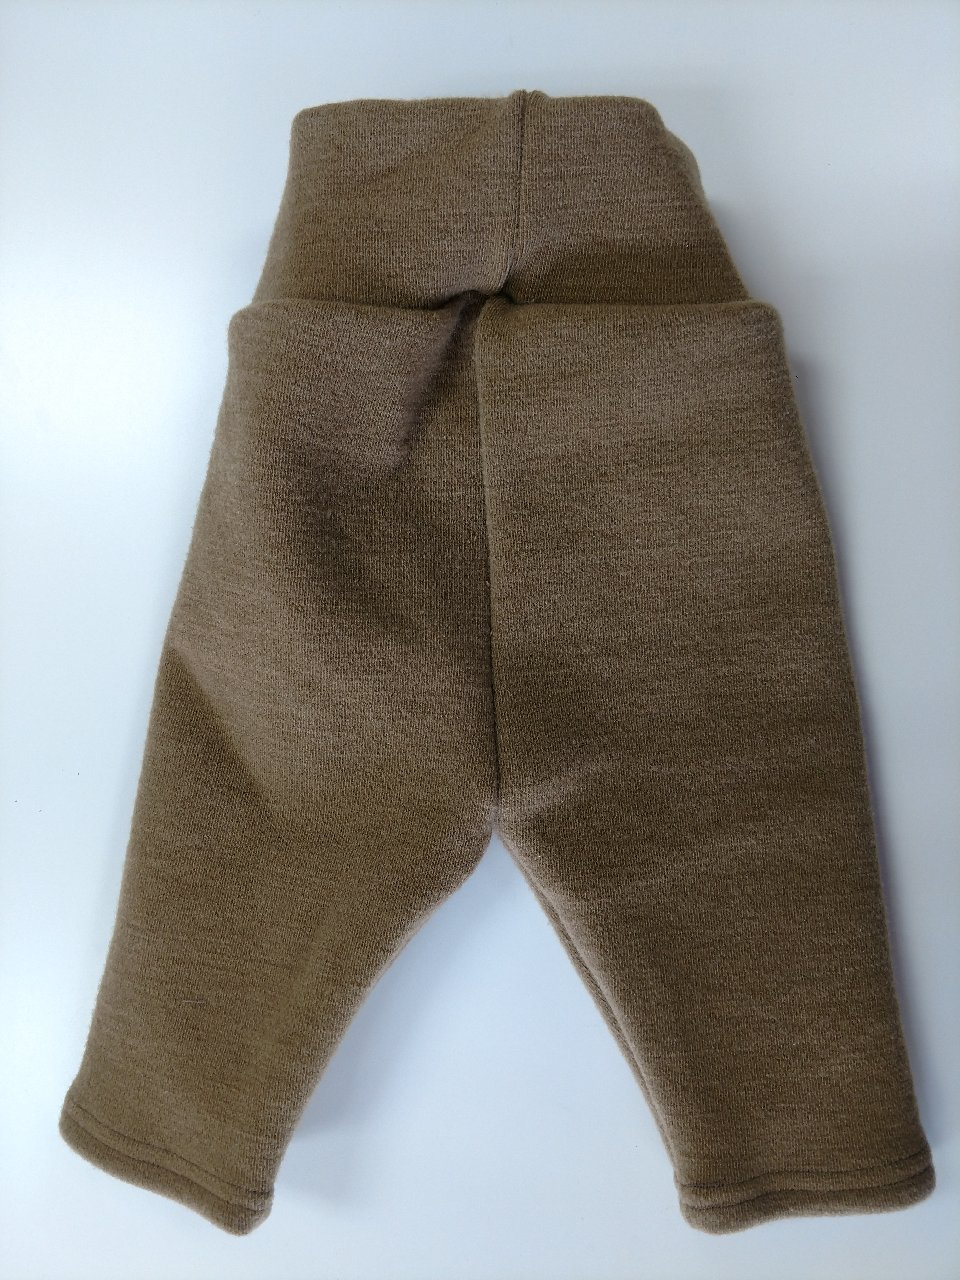 Truly Charis Wool Slim Fit Capris